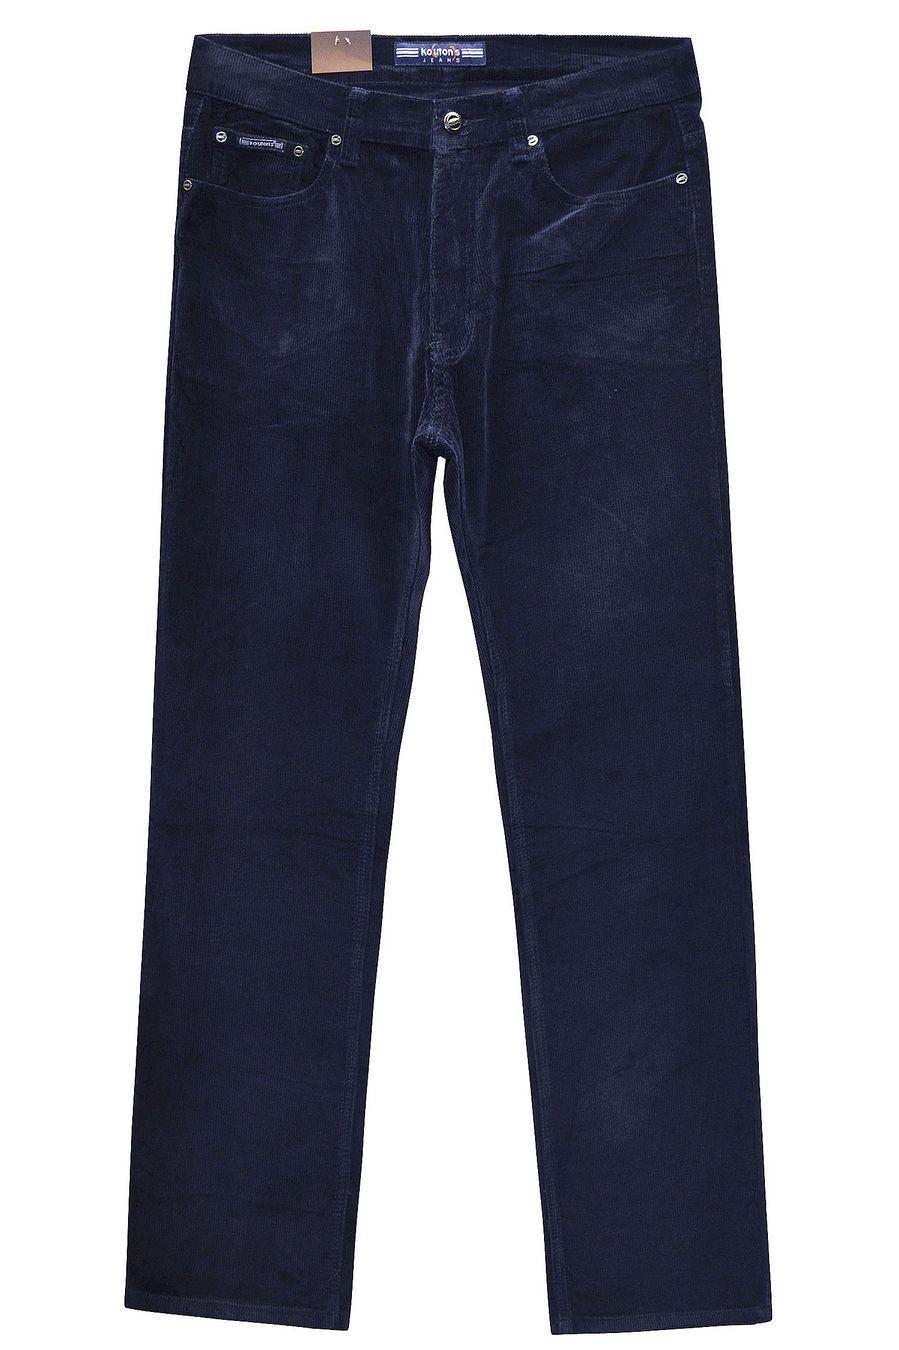 Брюки мужские Koutons KL-8126V Blue-Blue вельветовые - фото 1